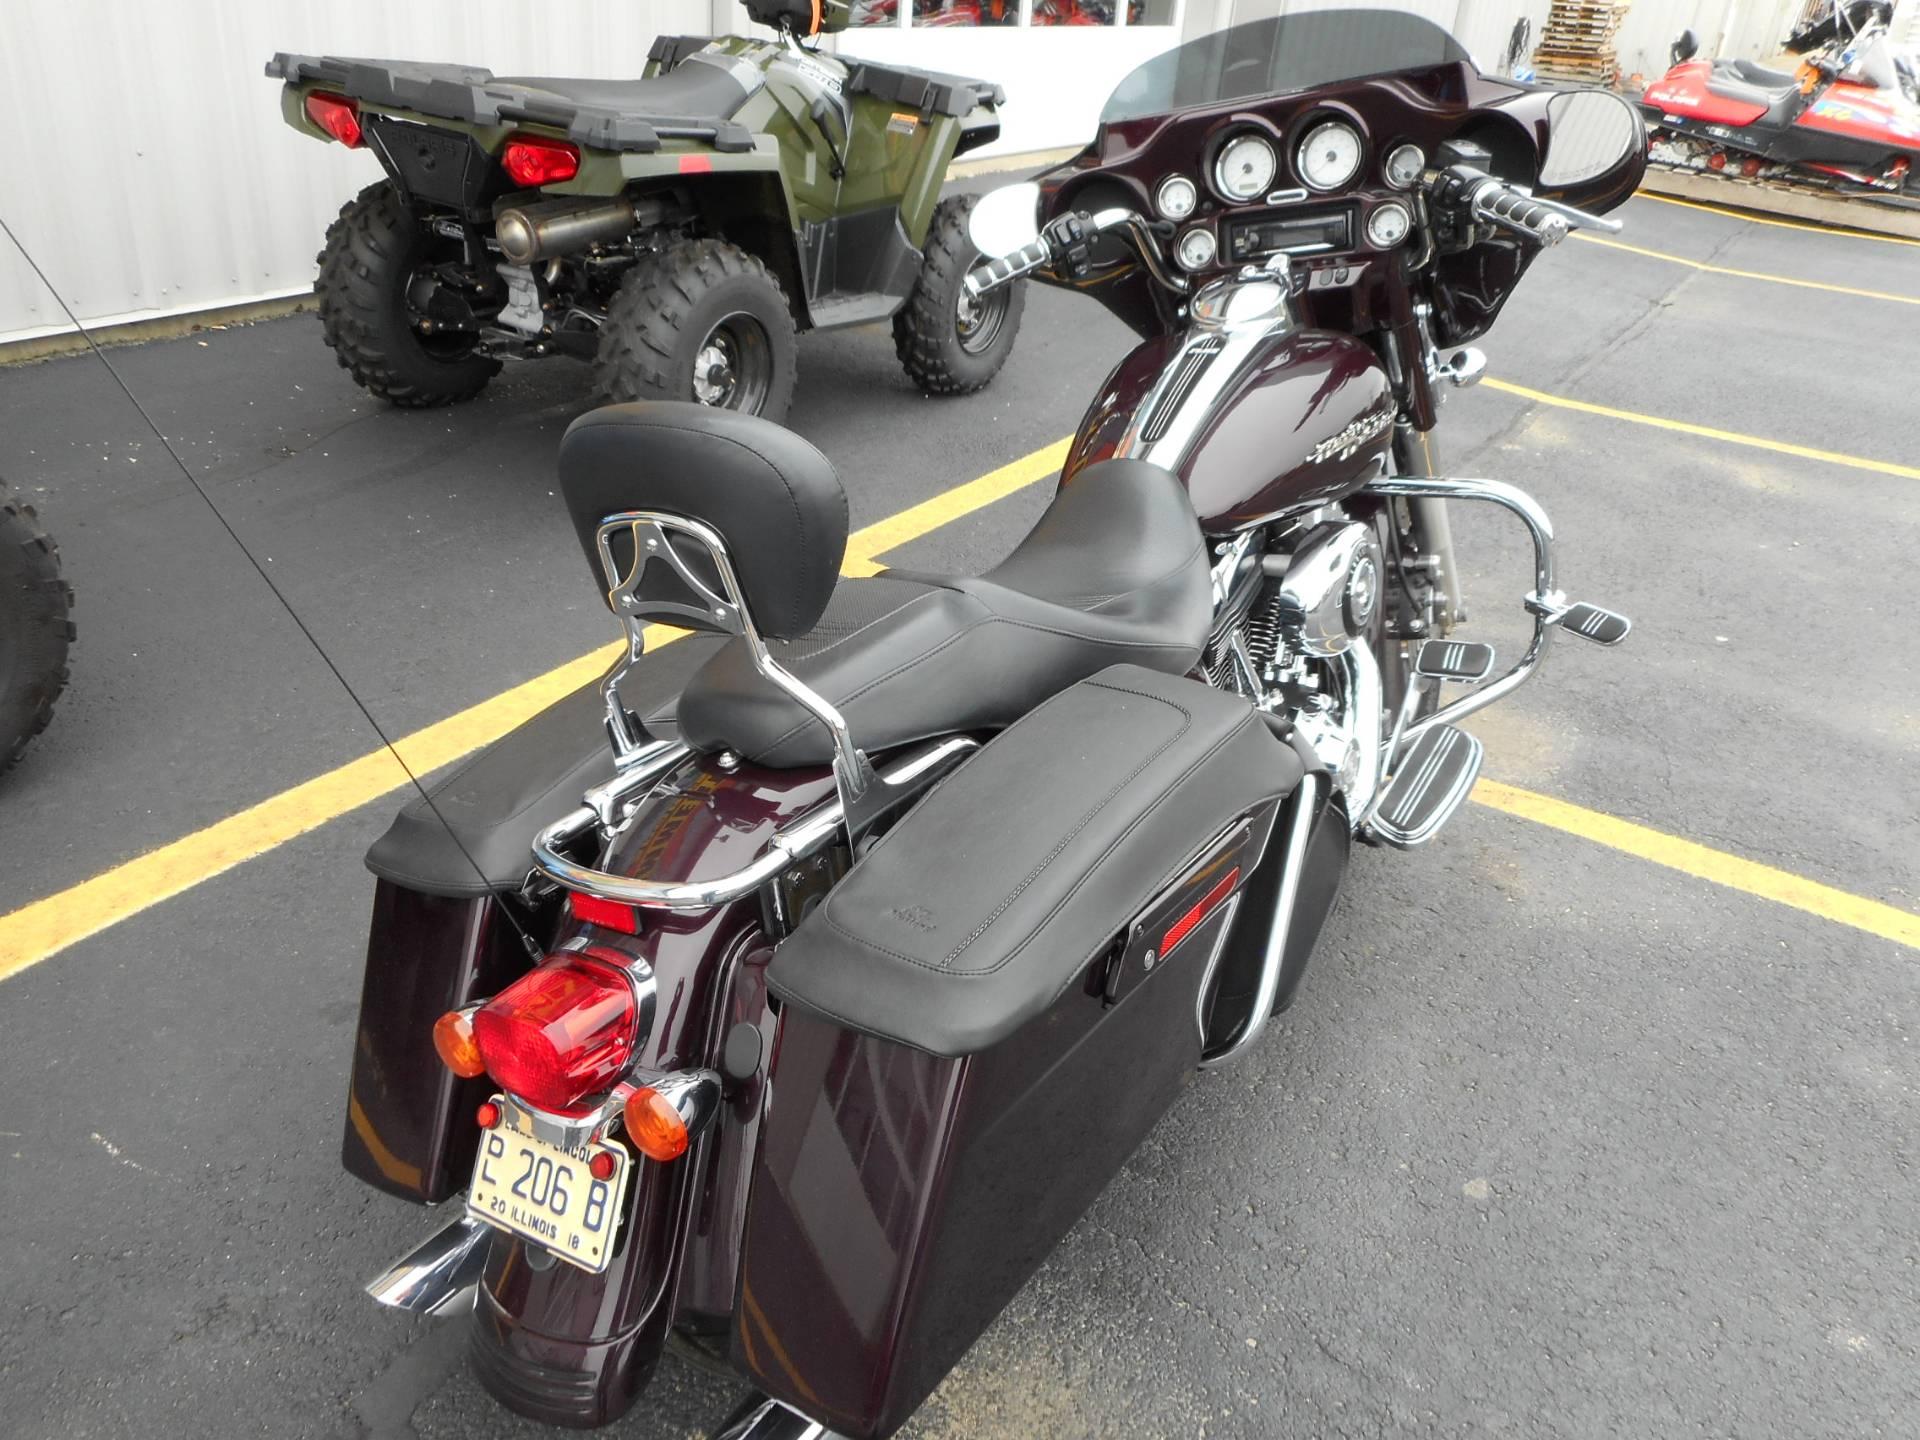 2007 Harley-Davidson FLHX Street Glide 7